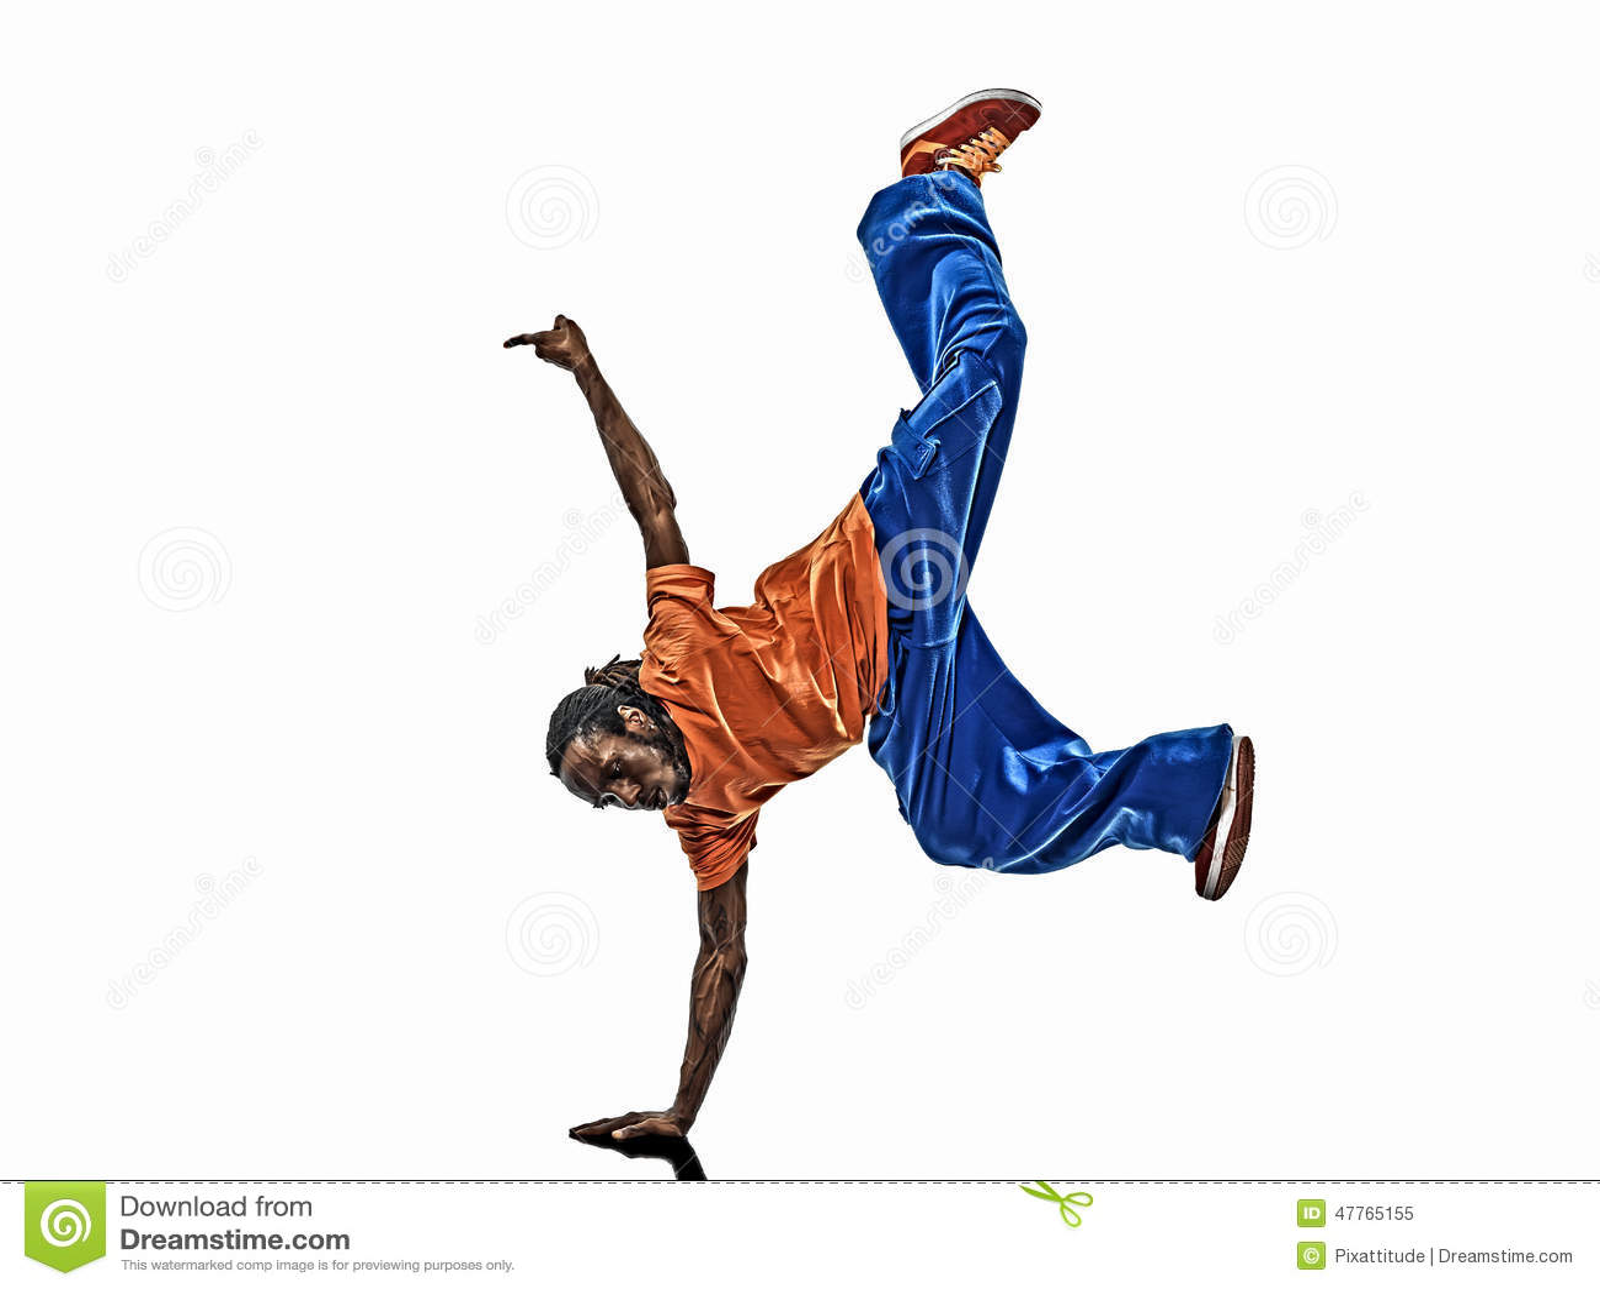 Ballerino acrobatico hip-hop della rottura che breakdancing verticale del giovane